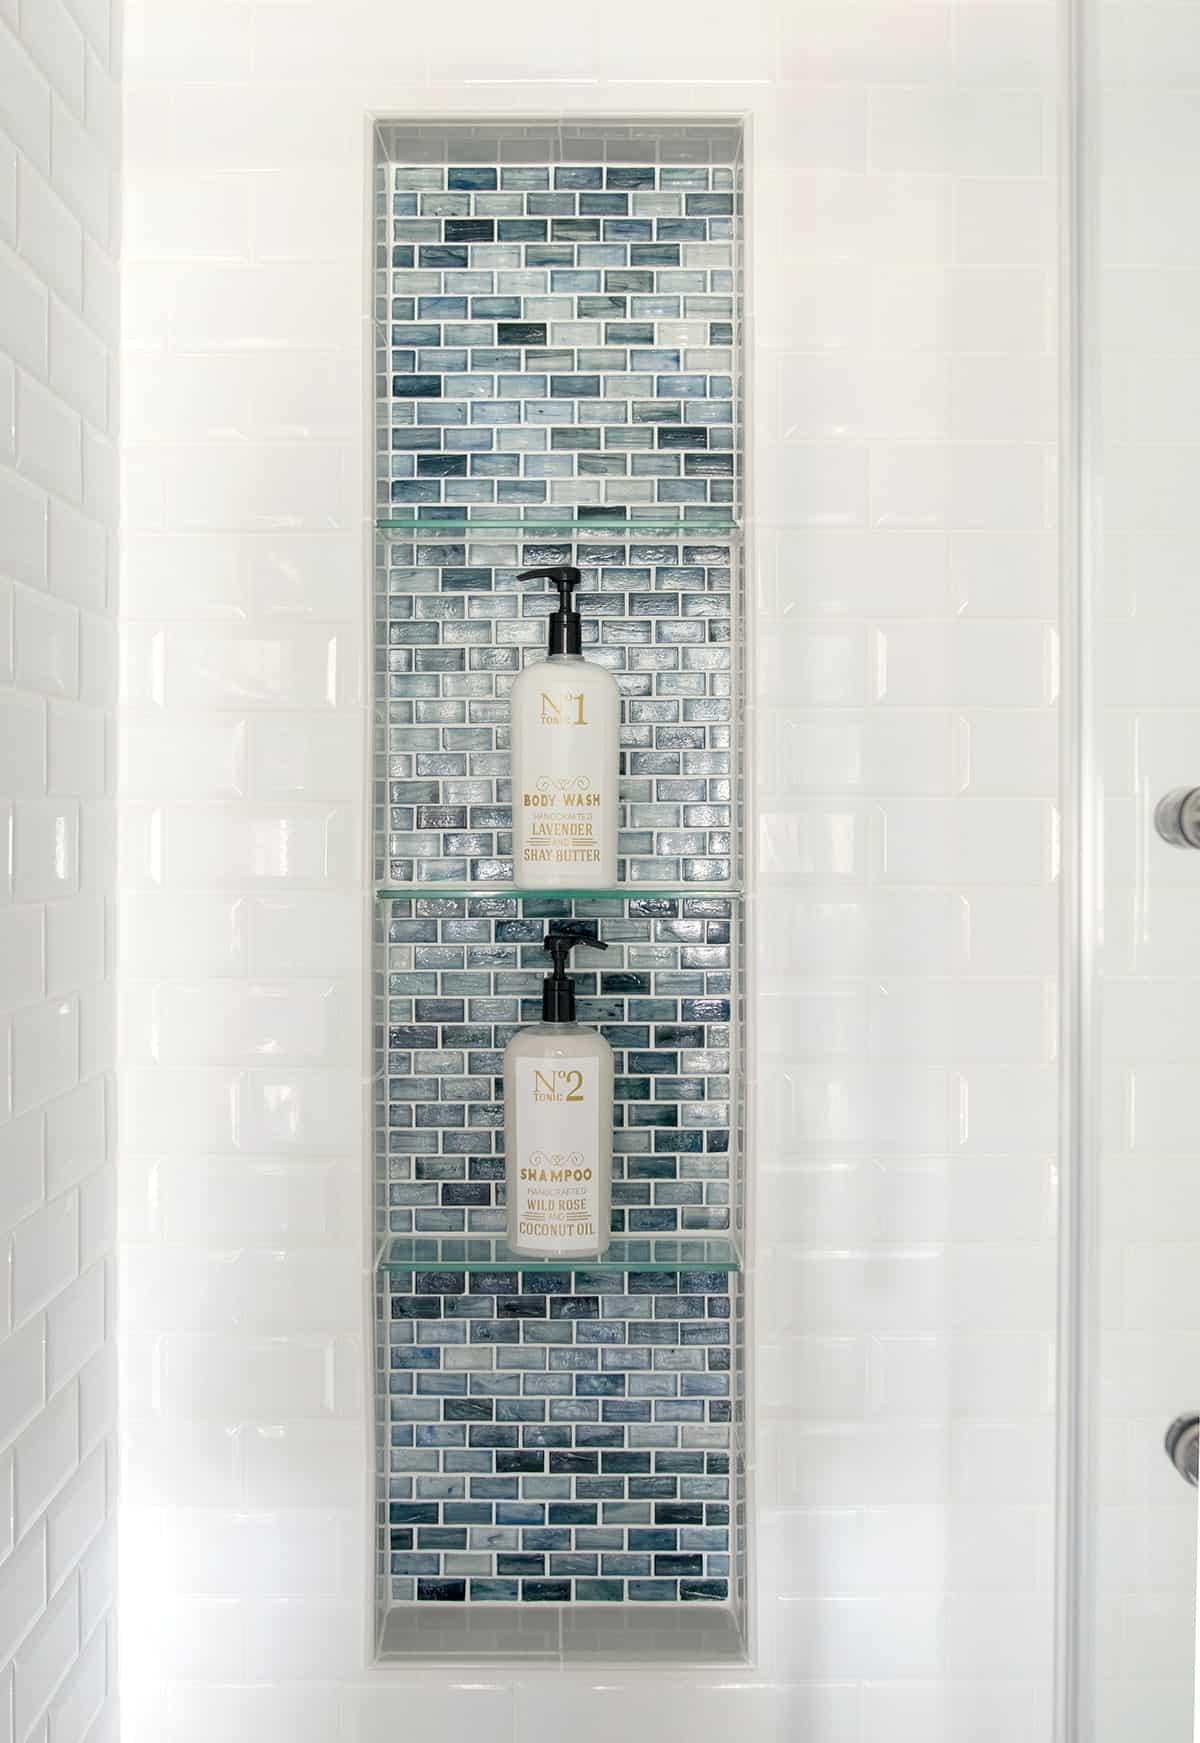 Glass shelves on tiles mosaic shower wall.